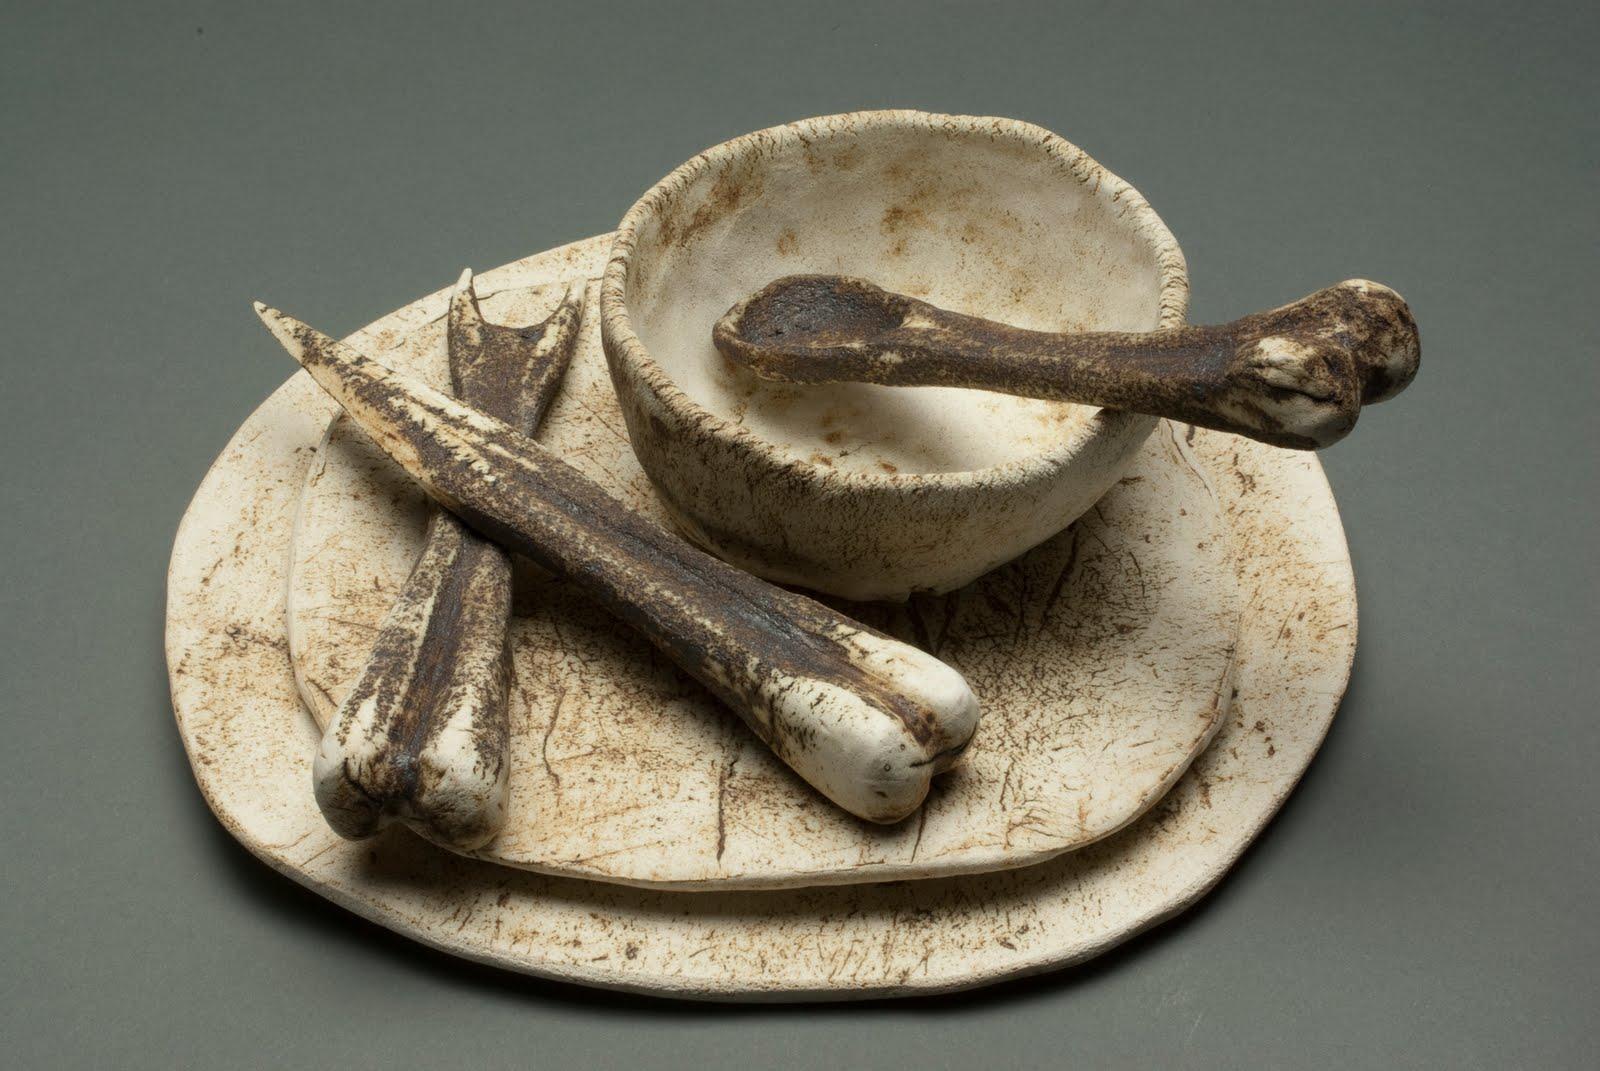 Caveman Artefacts : Valerie jean pottery photos